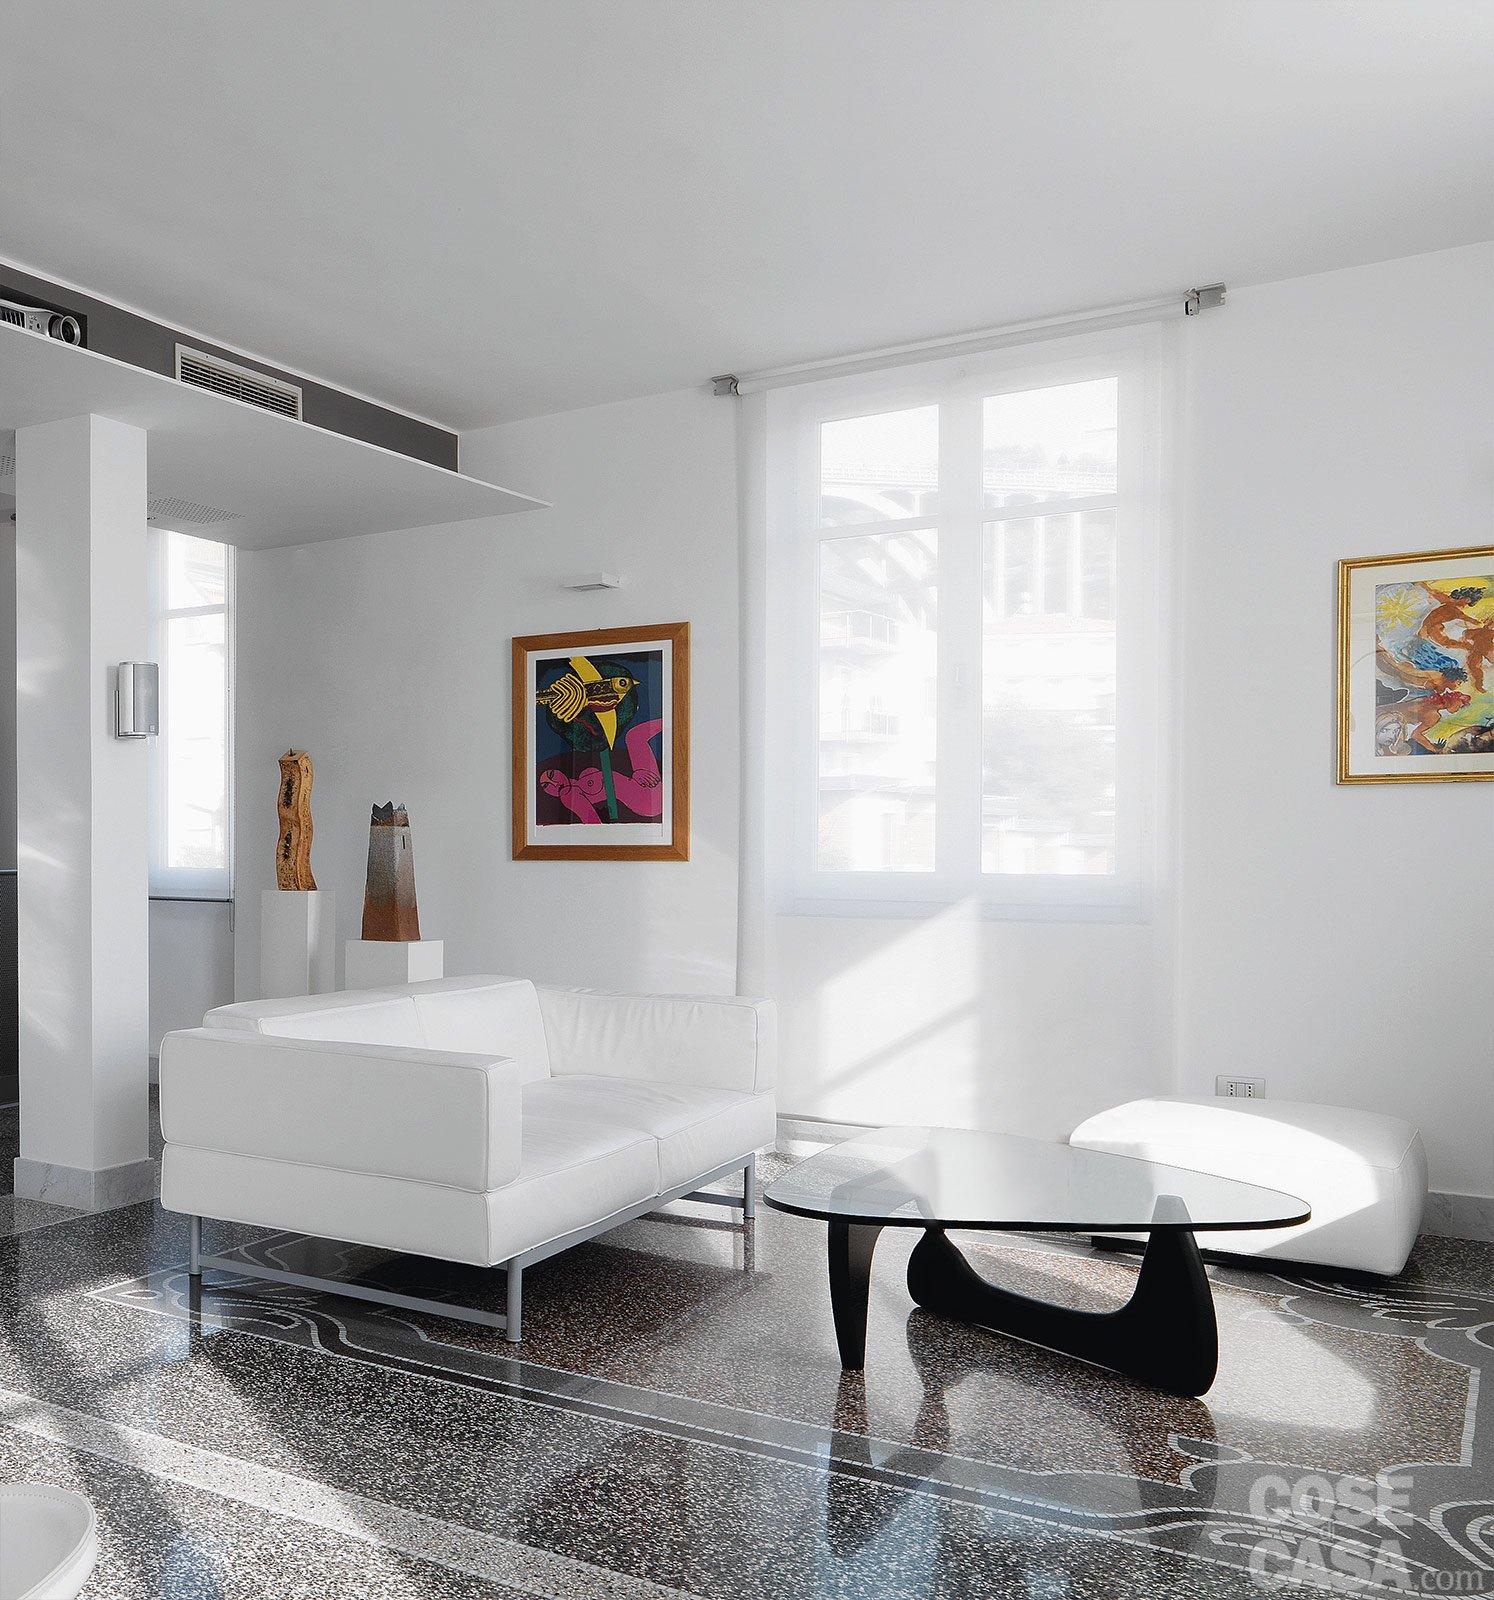 Casa soluzioni hi tech per interni anni 39 30 cose di casa for Design interni appartamenti